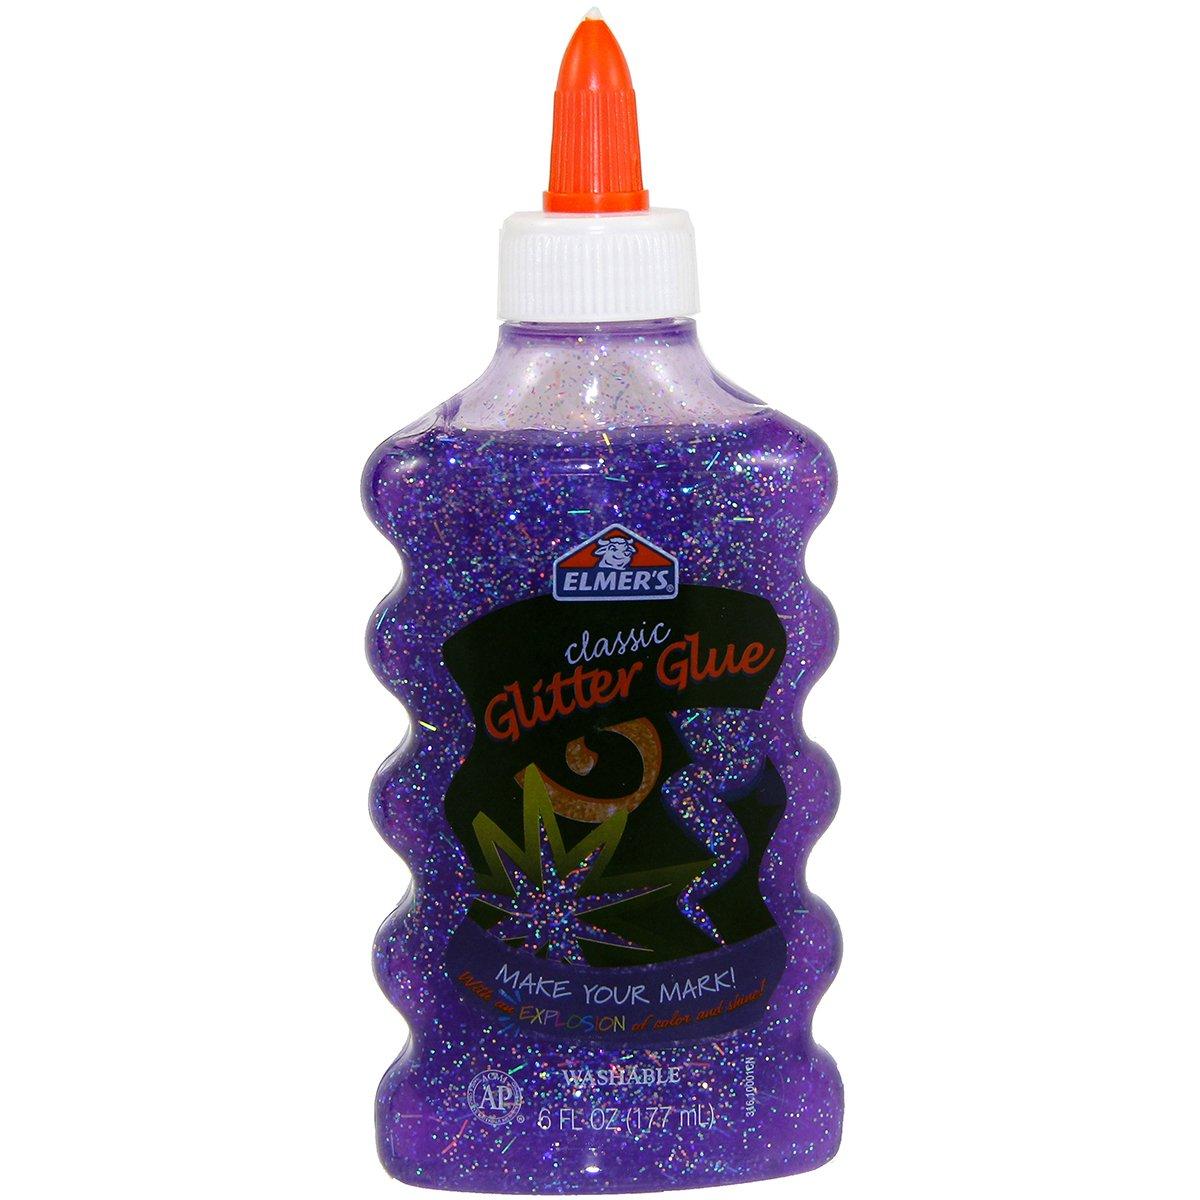 Elmer's Liquid Glitter Glue, Washable, Purple, 6 Ounces, 1 Count - Great For Making Slime